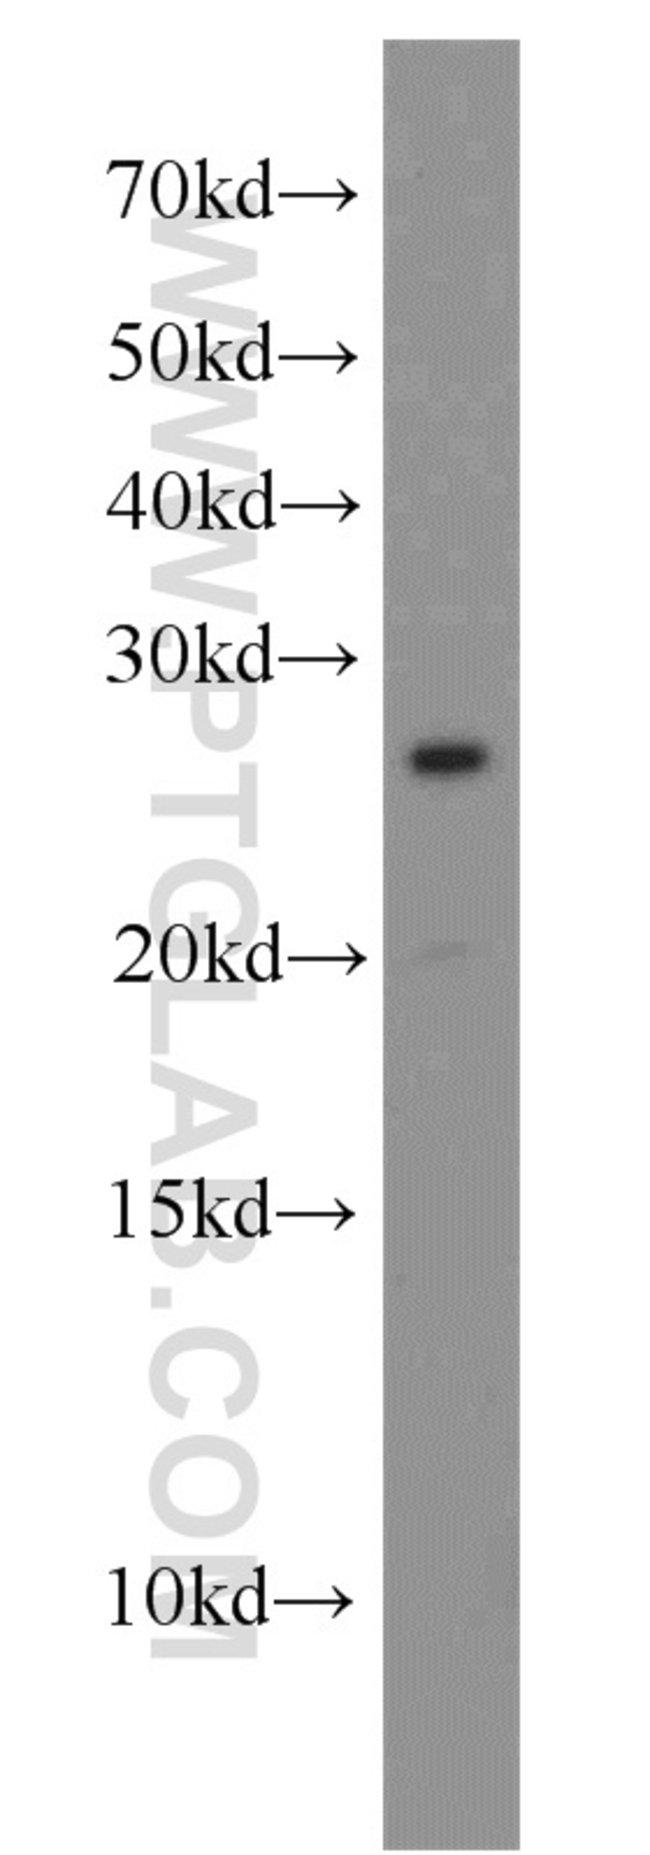 CEP70 Rabbit anti-Human, Mouse, Rat, Polyclonal, Proteintech 150 μL; Unconjugated Produkte